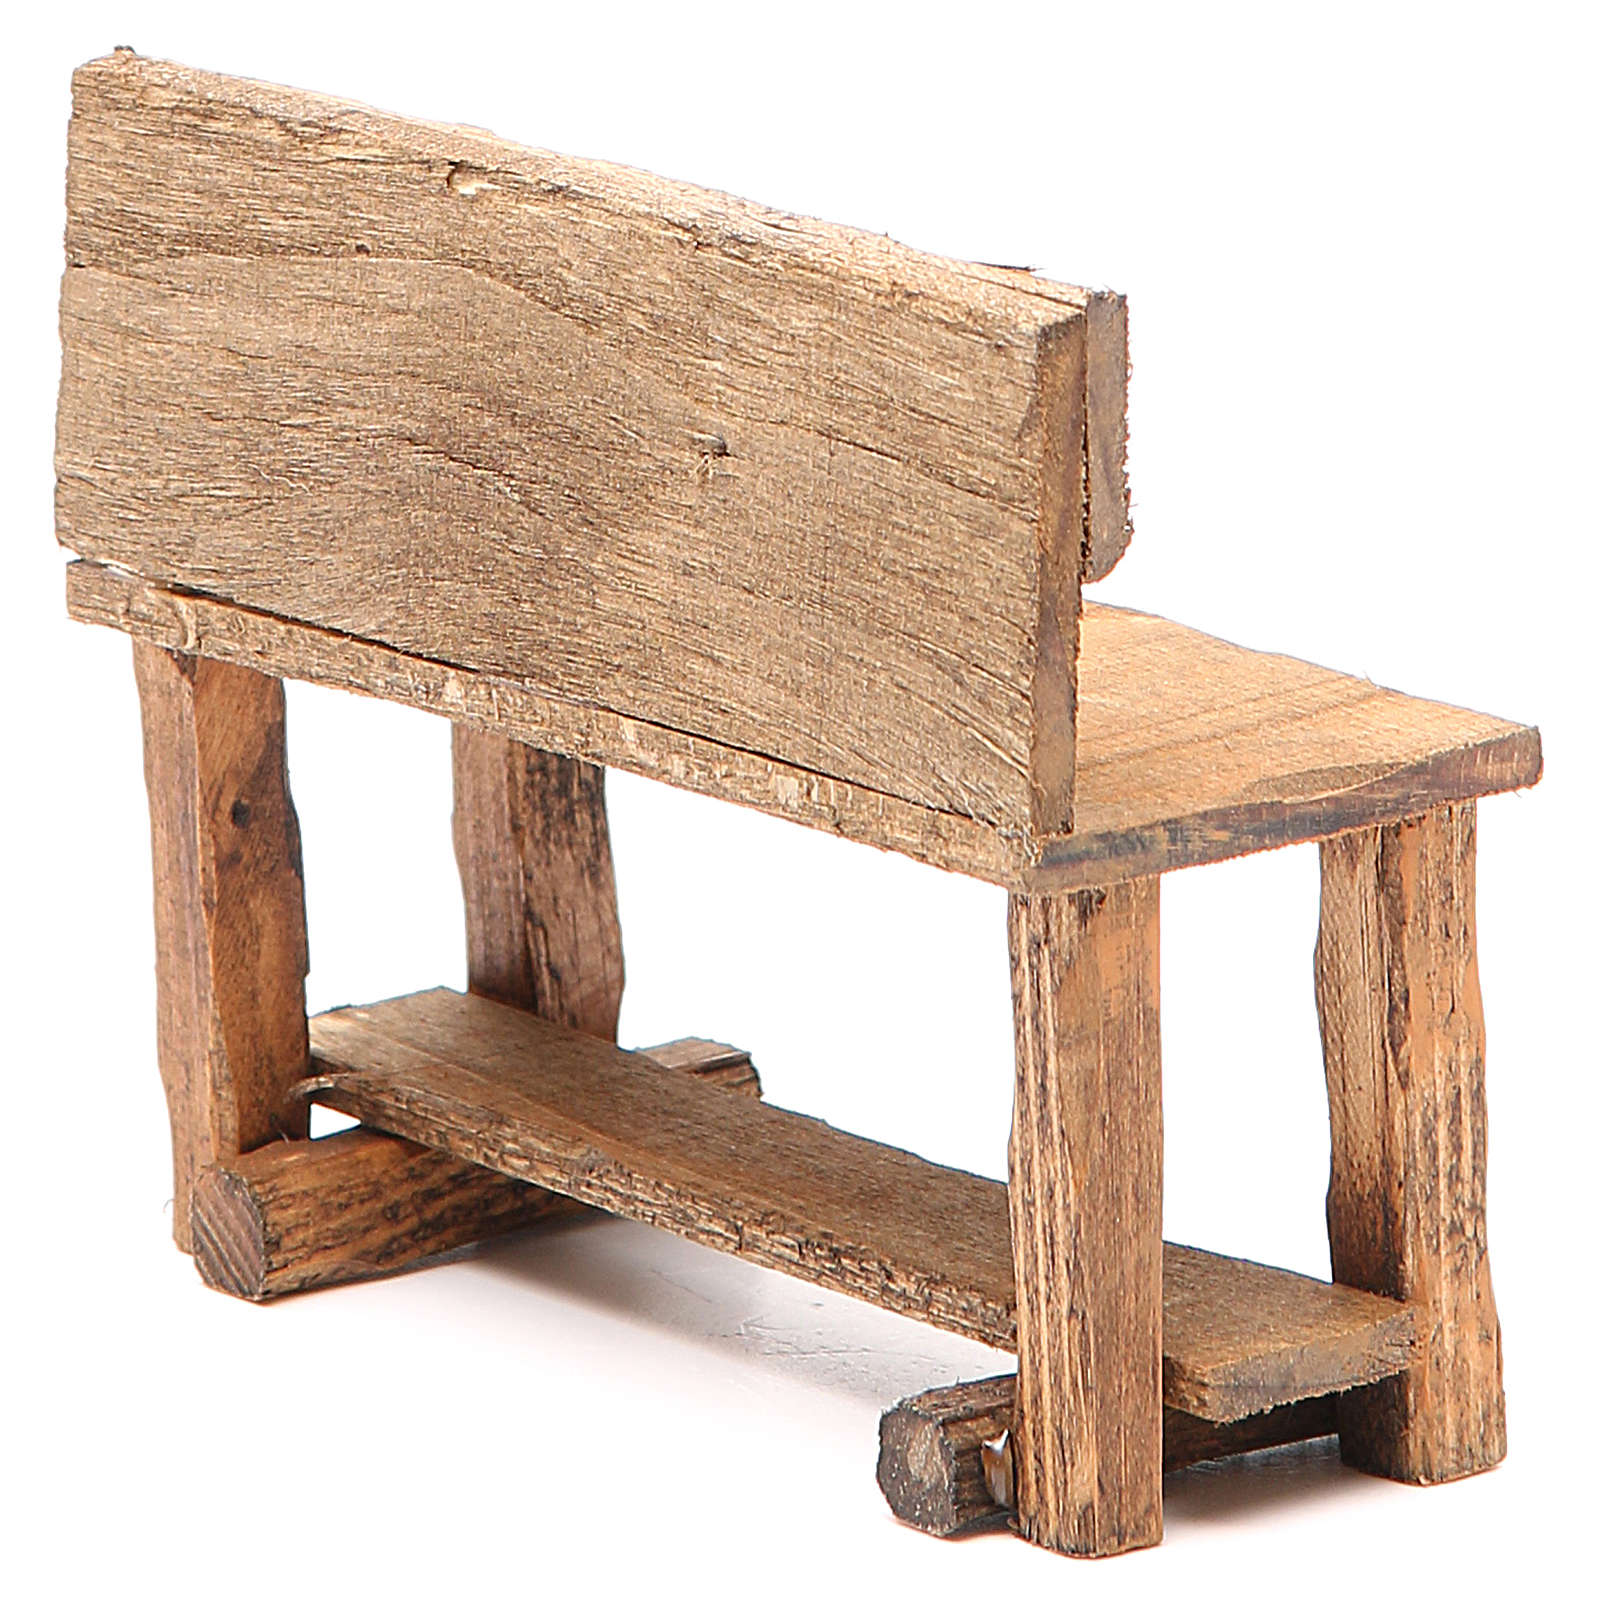 Work bench for nativity 10x5x9cm 4